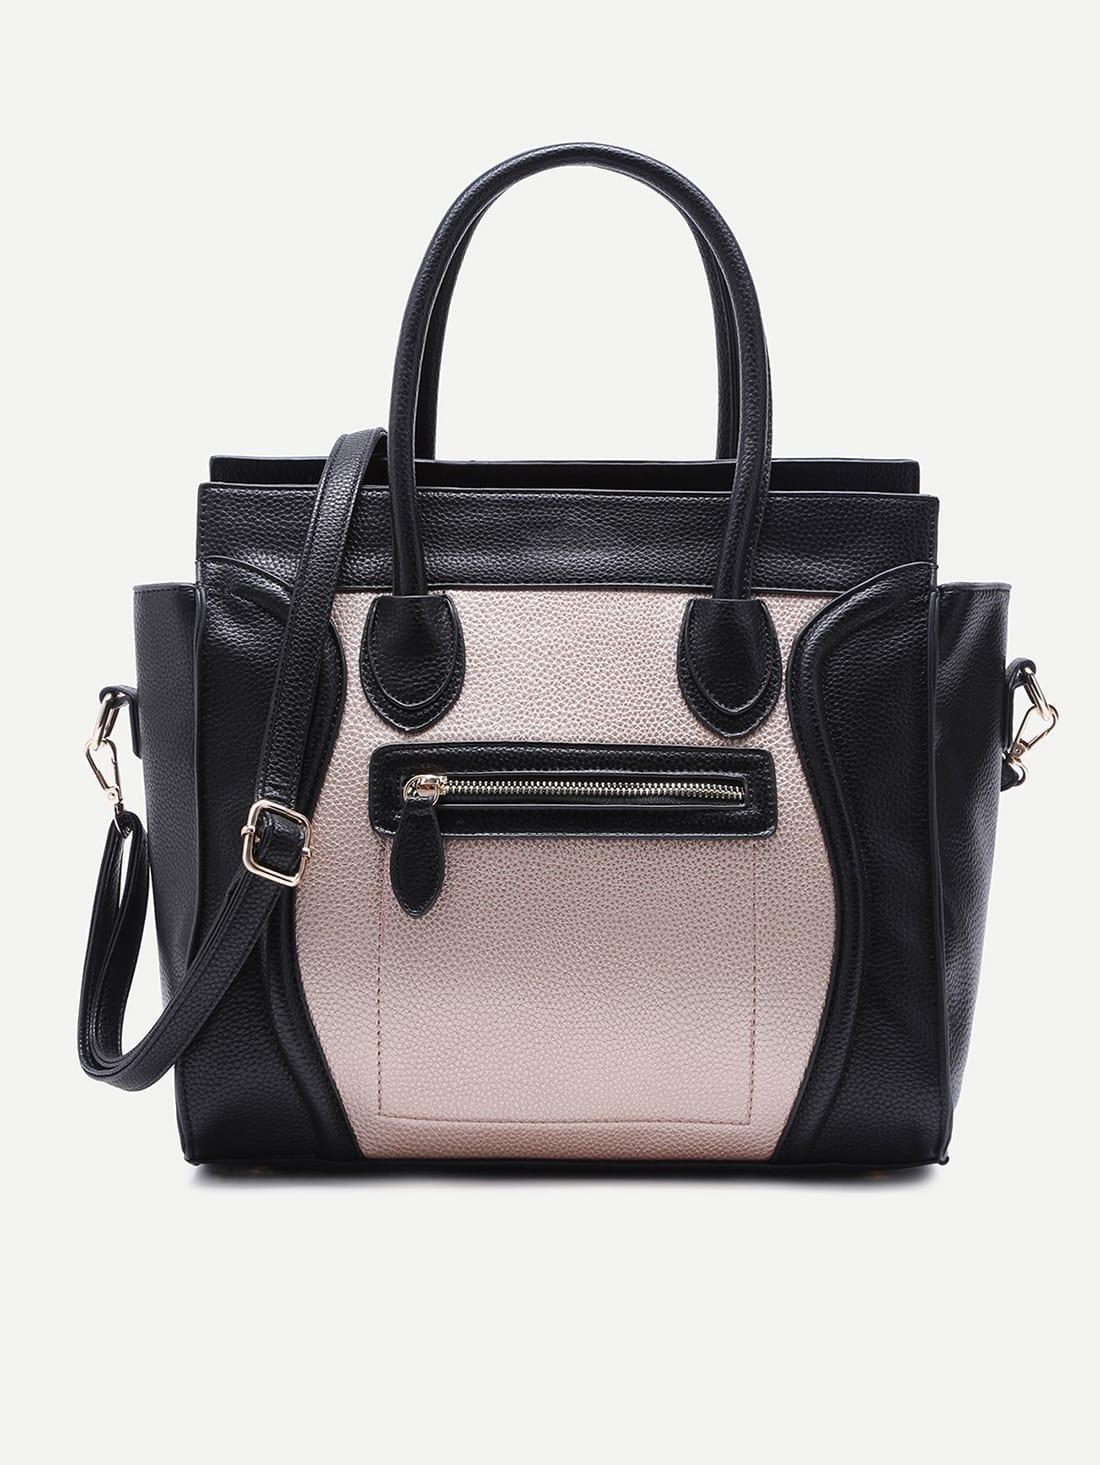 bag161018905_2